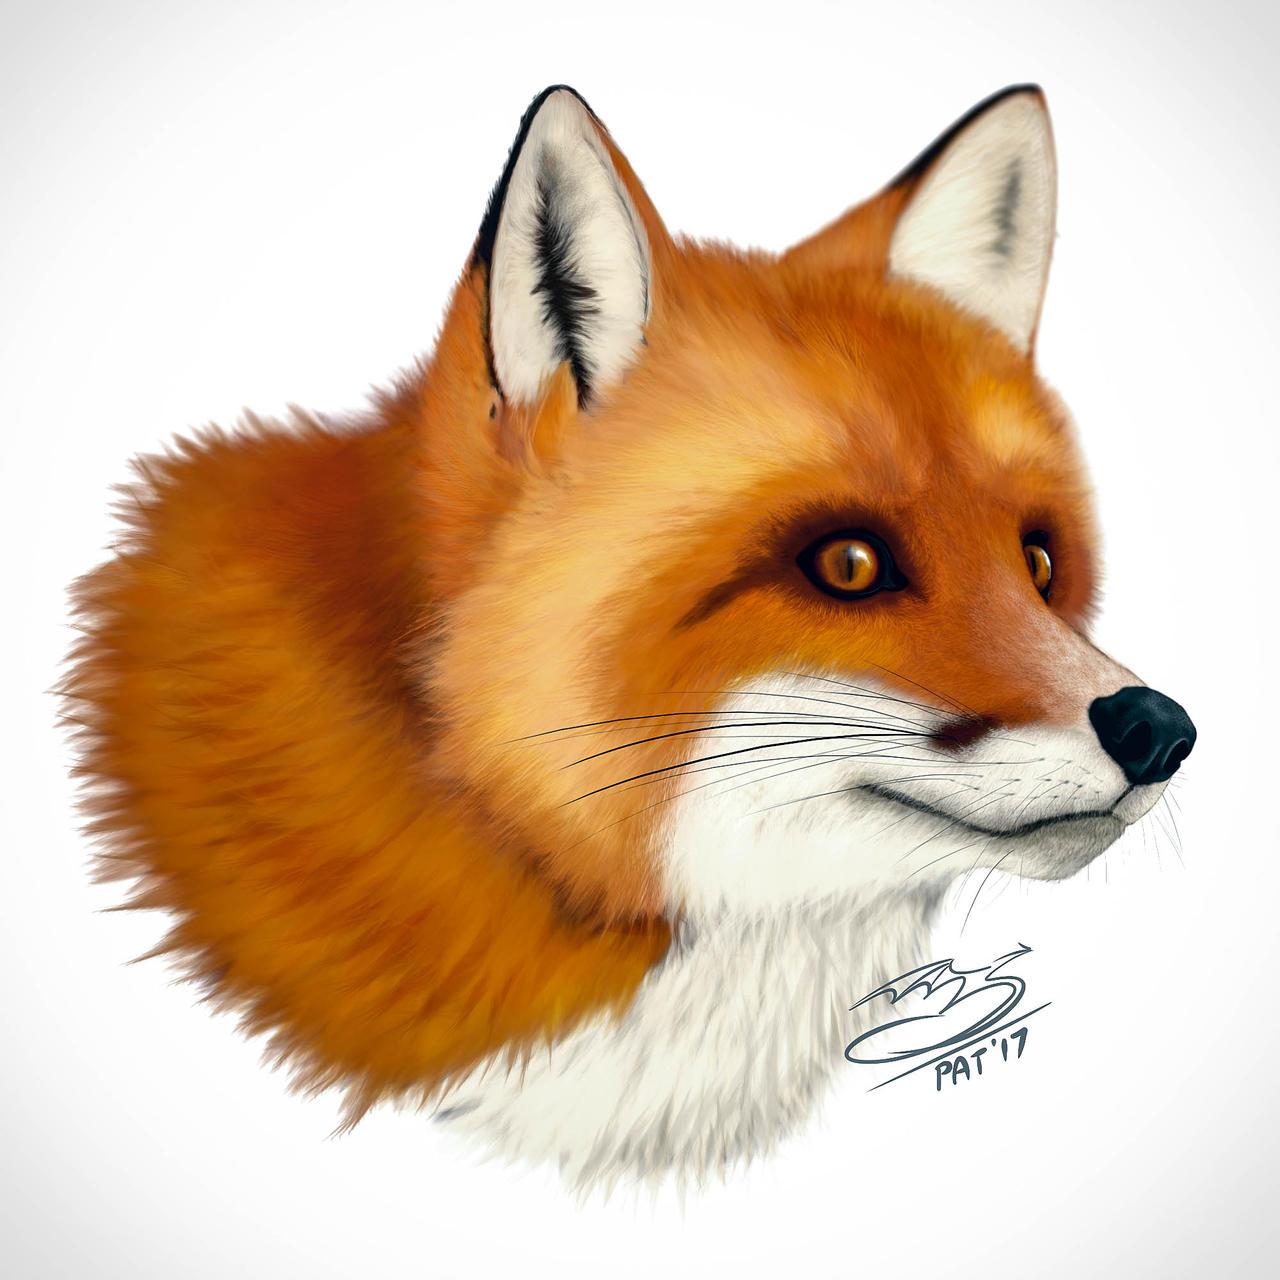 Fur Study - Adorable Fox is Adorable